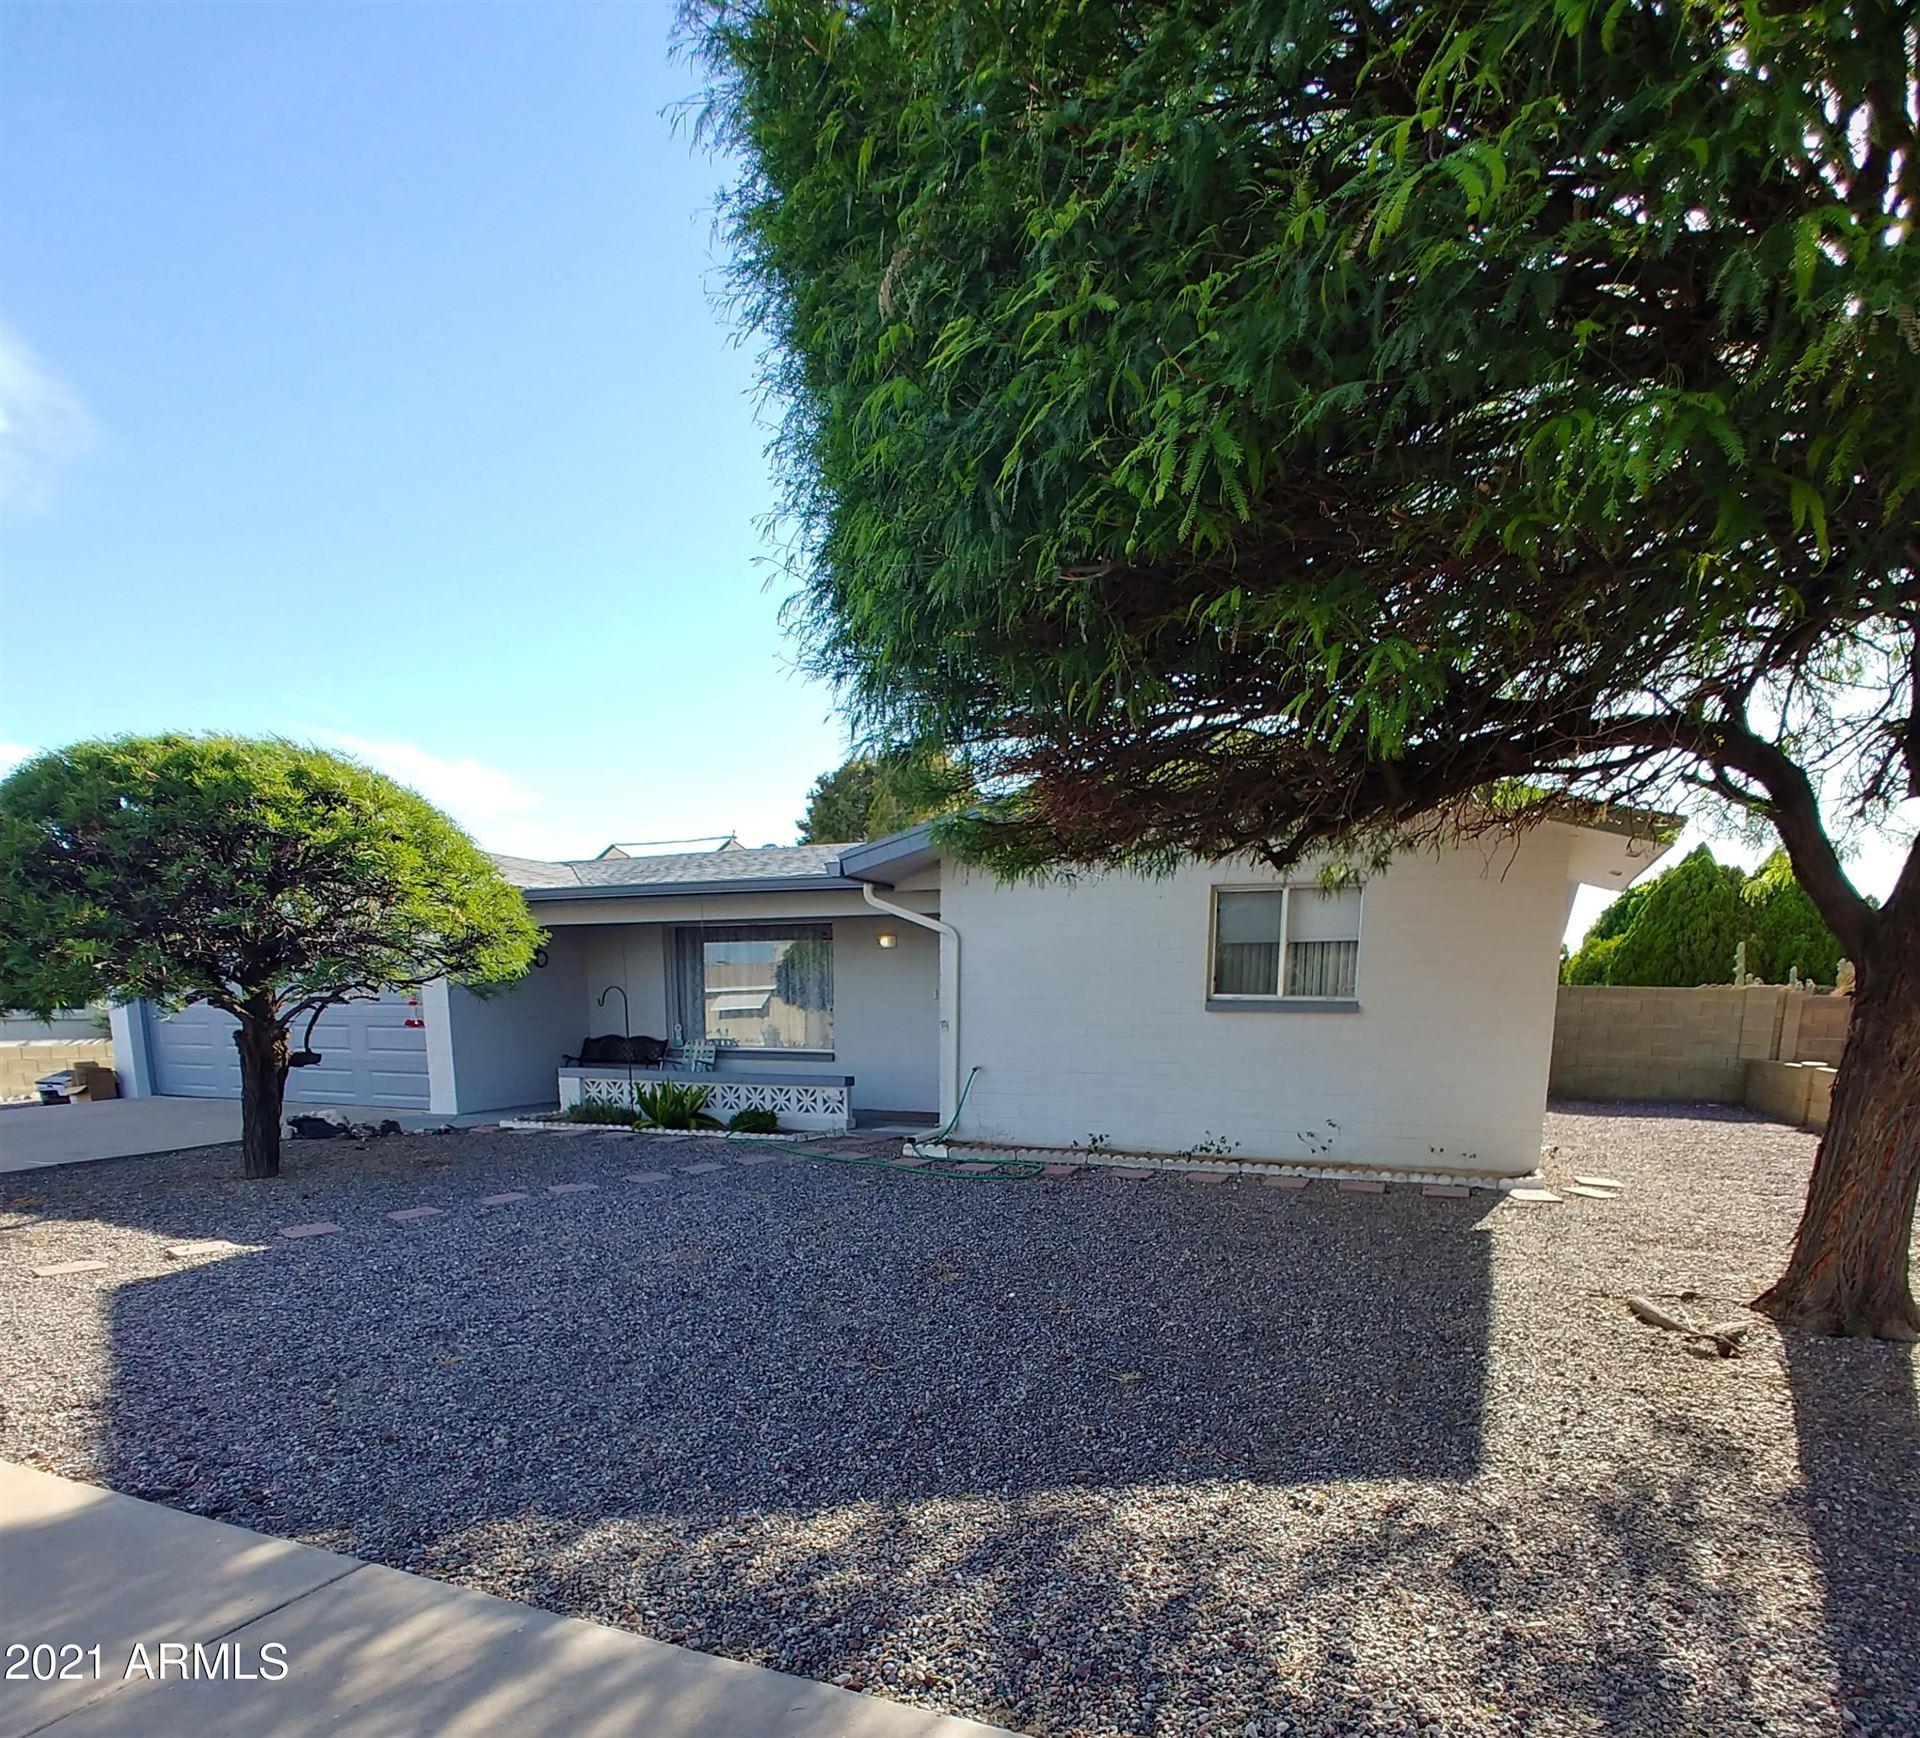 726 N 65th Place, Mesa, AZ 85205 - MLS#: 6251825